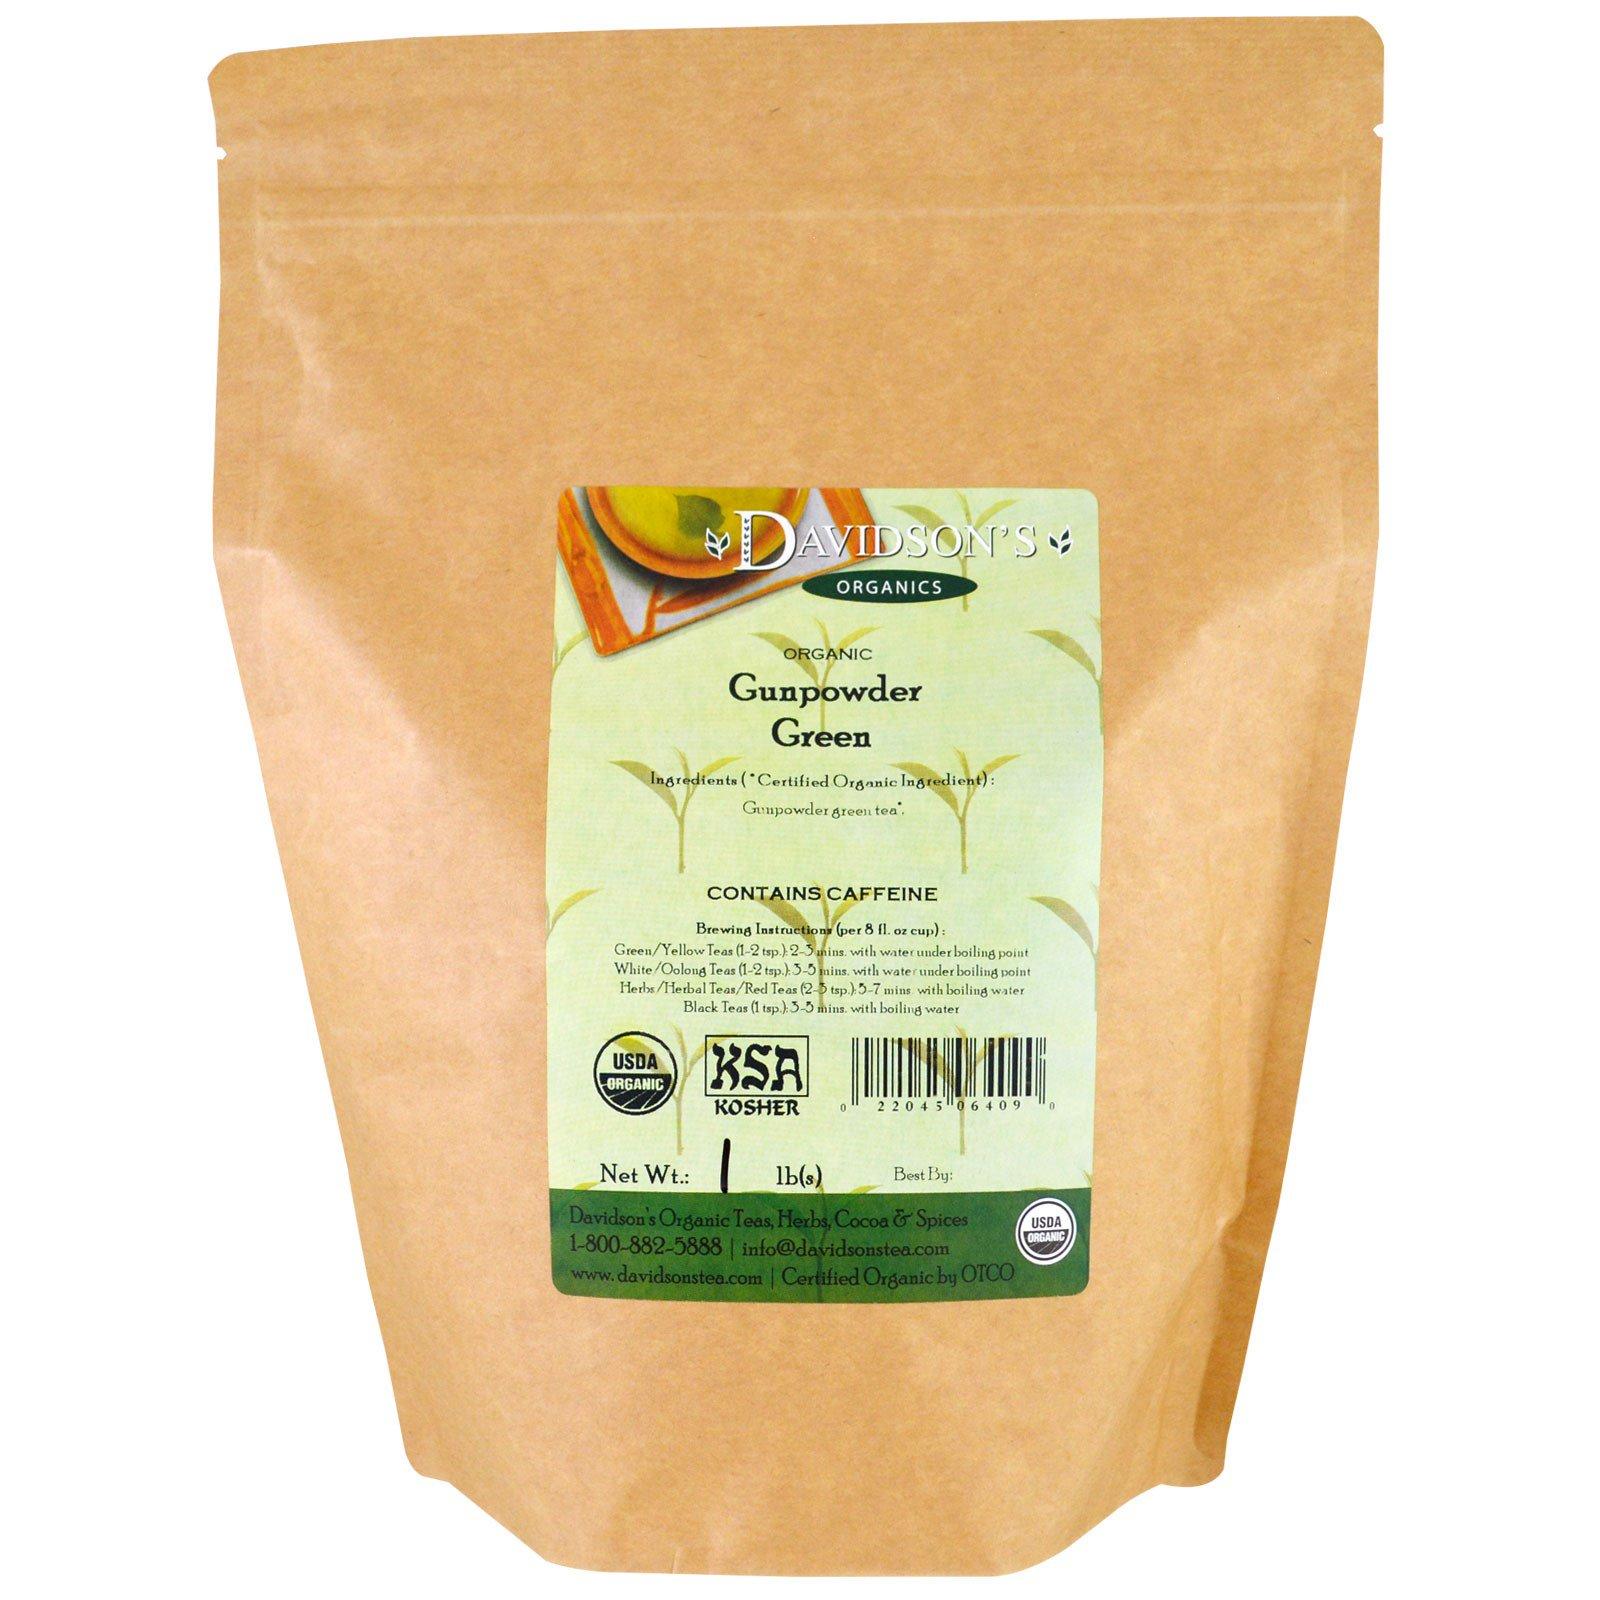 Pearl gunpowder green tea the tao of tea.